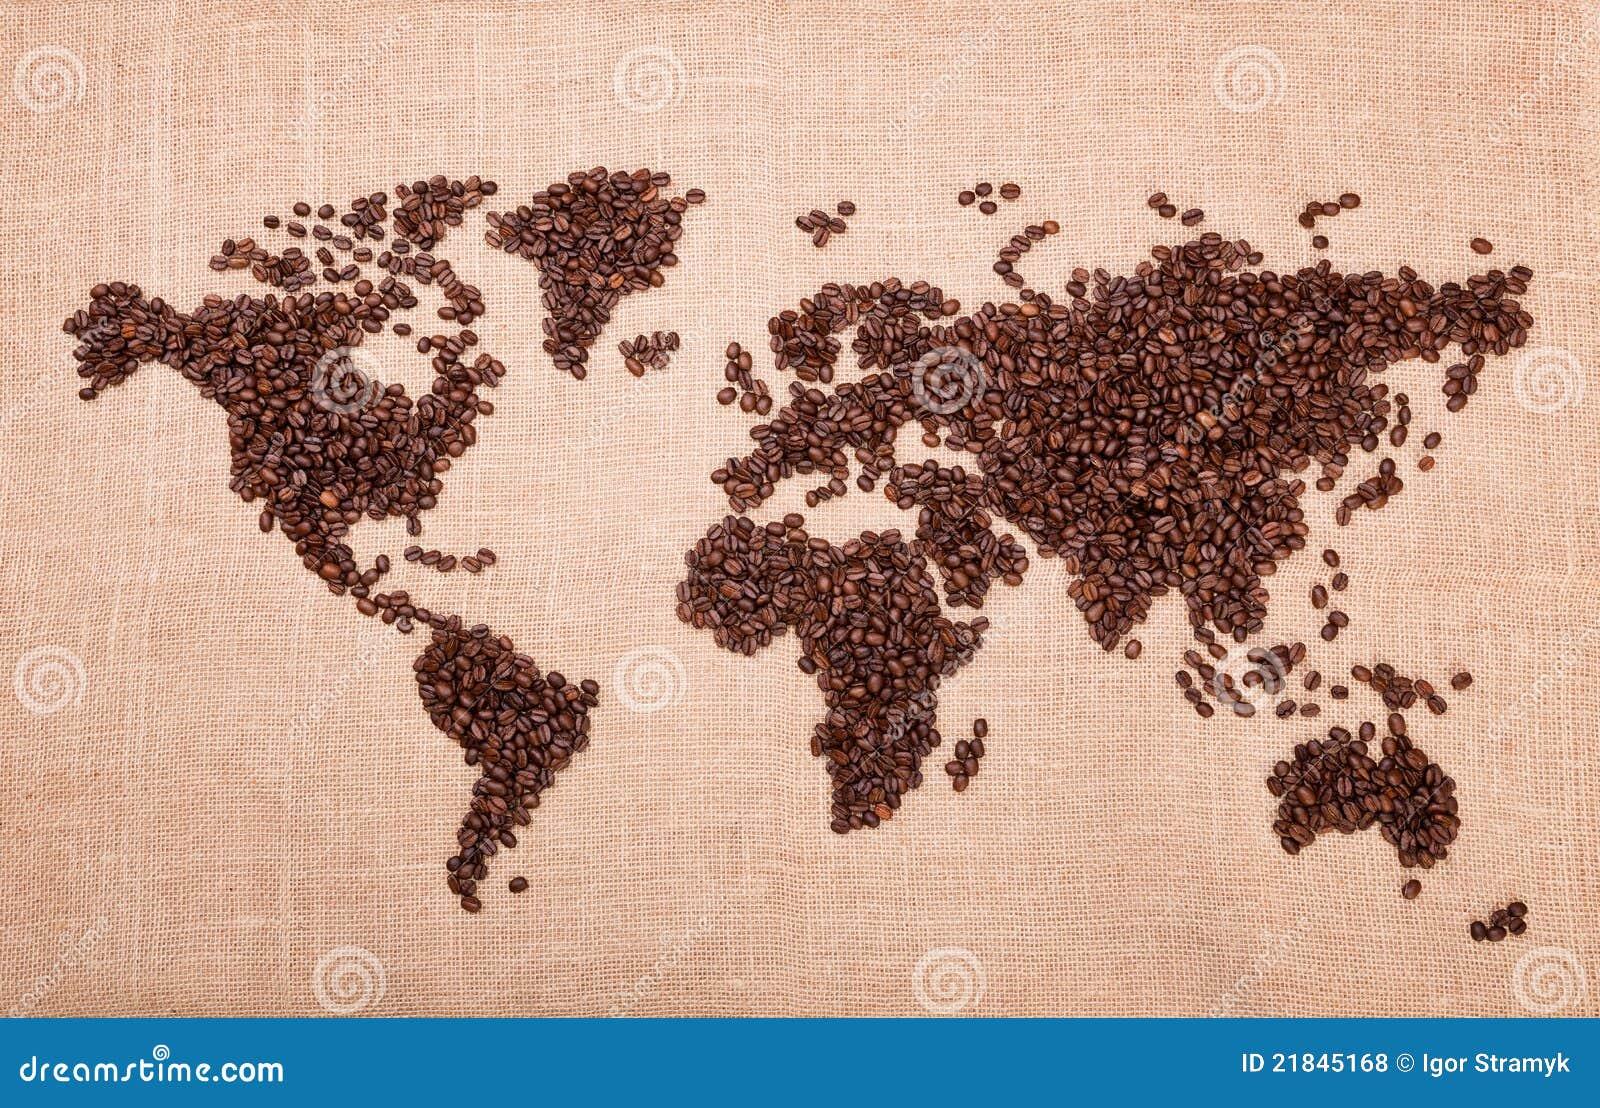 Mapa feito do café